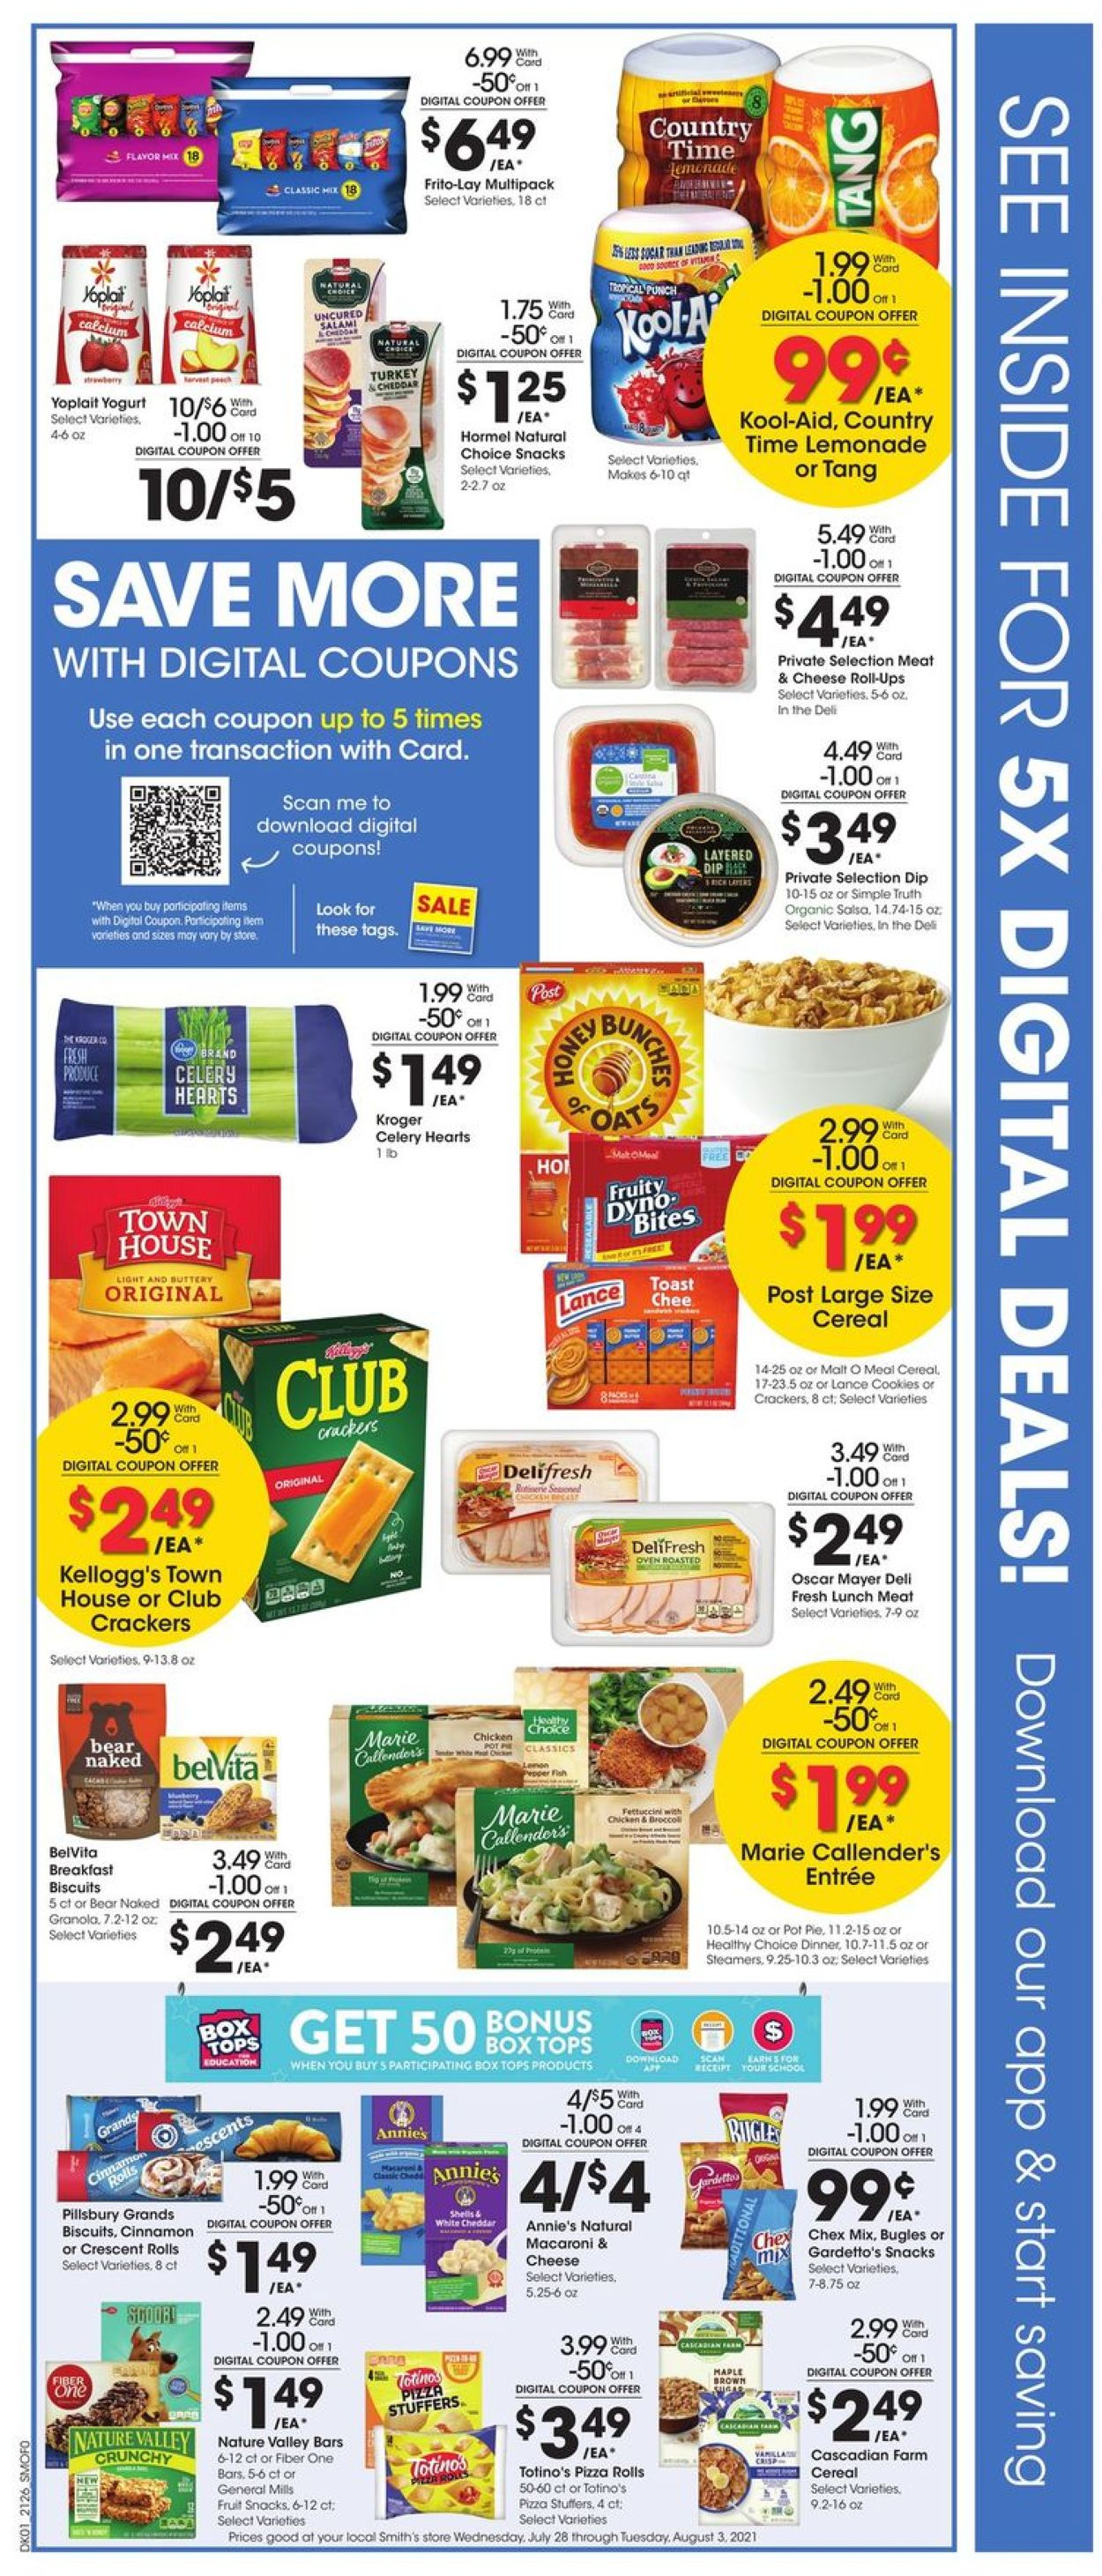 Smith's Weekly Ad Circular - valid 07/28-08/03/2021 (Page 2)